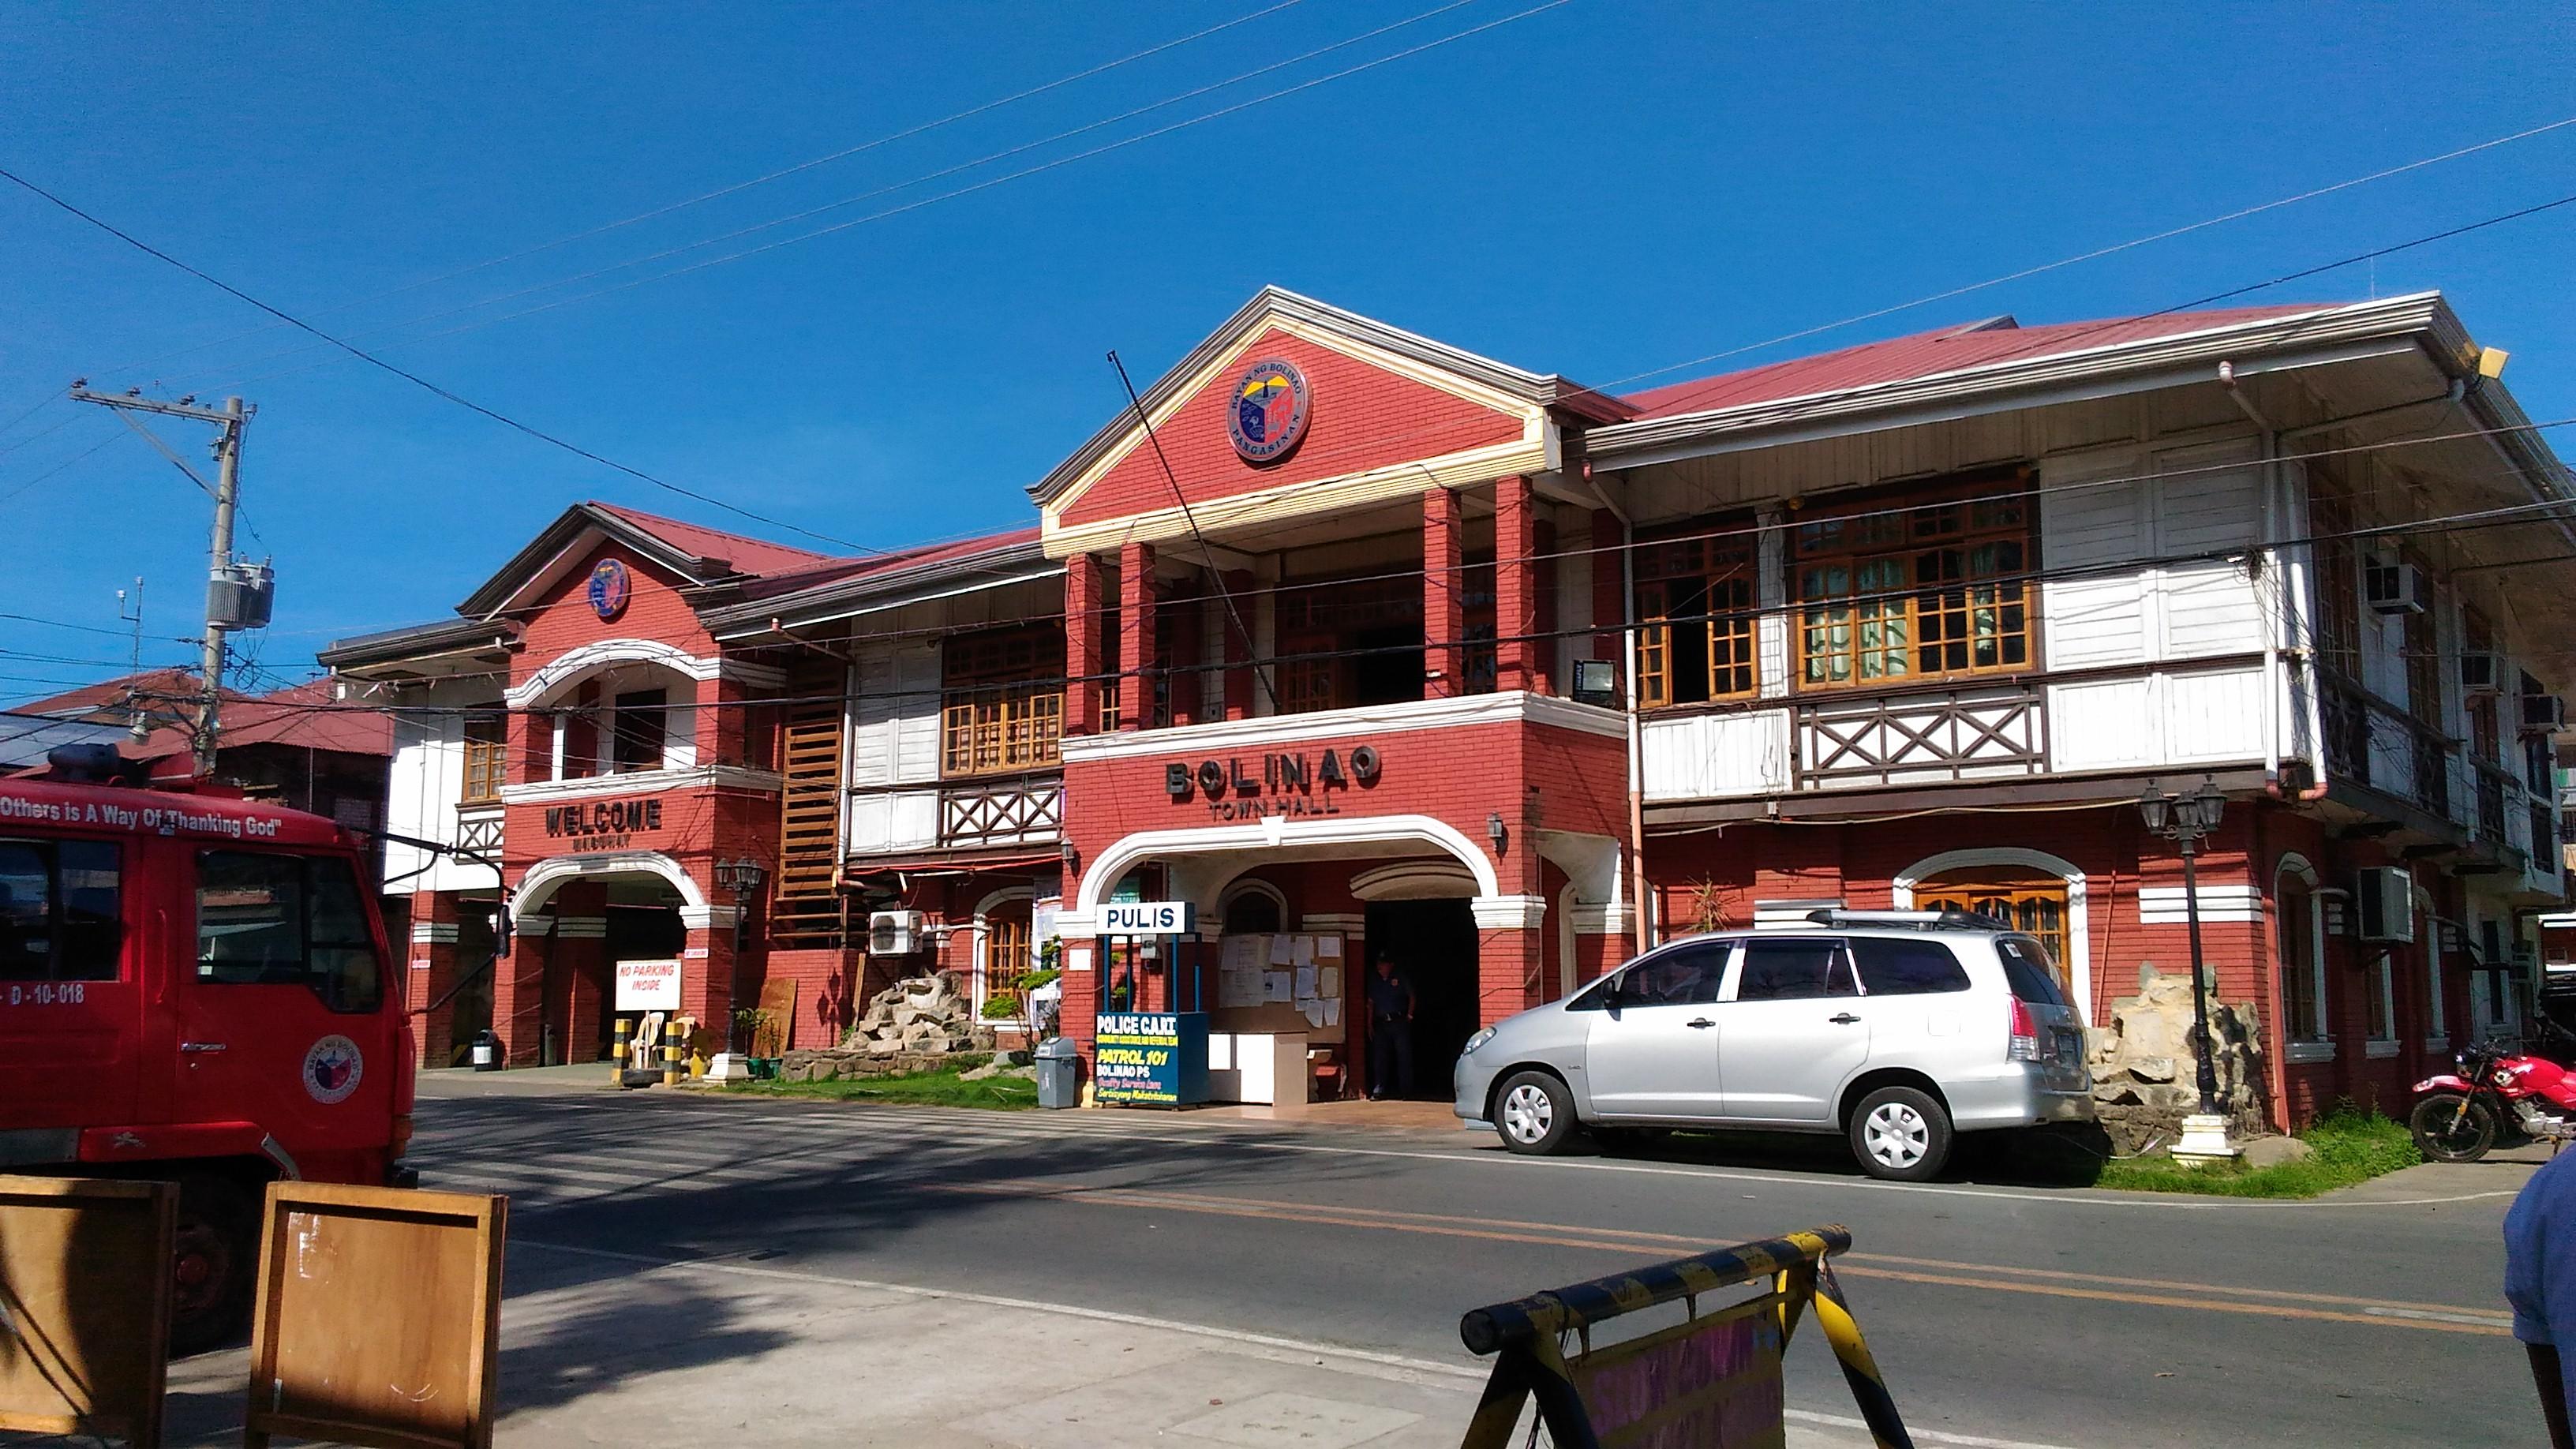 bolinao town hall